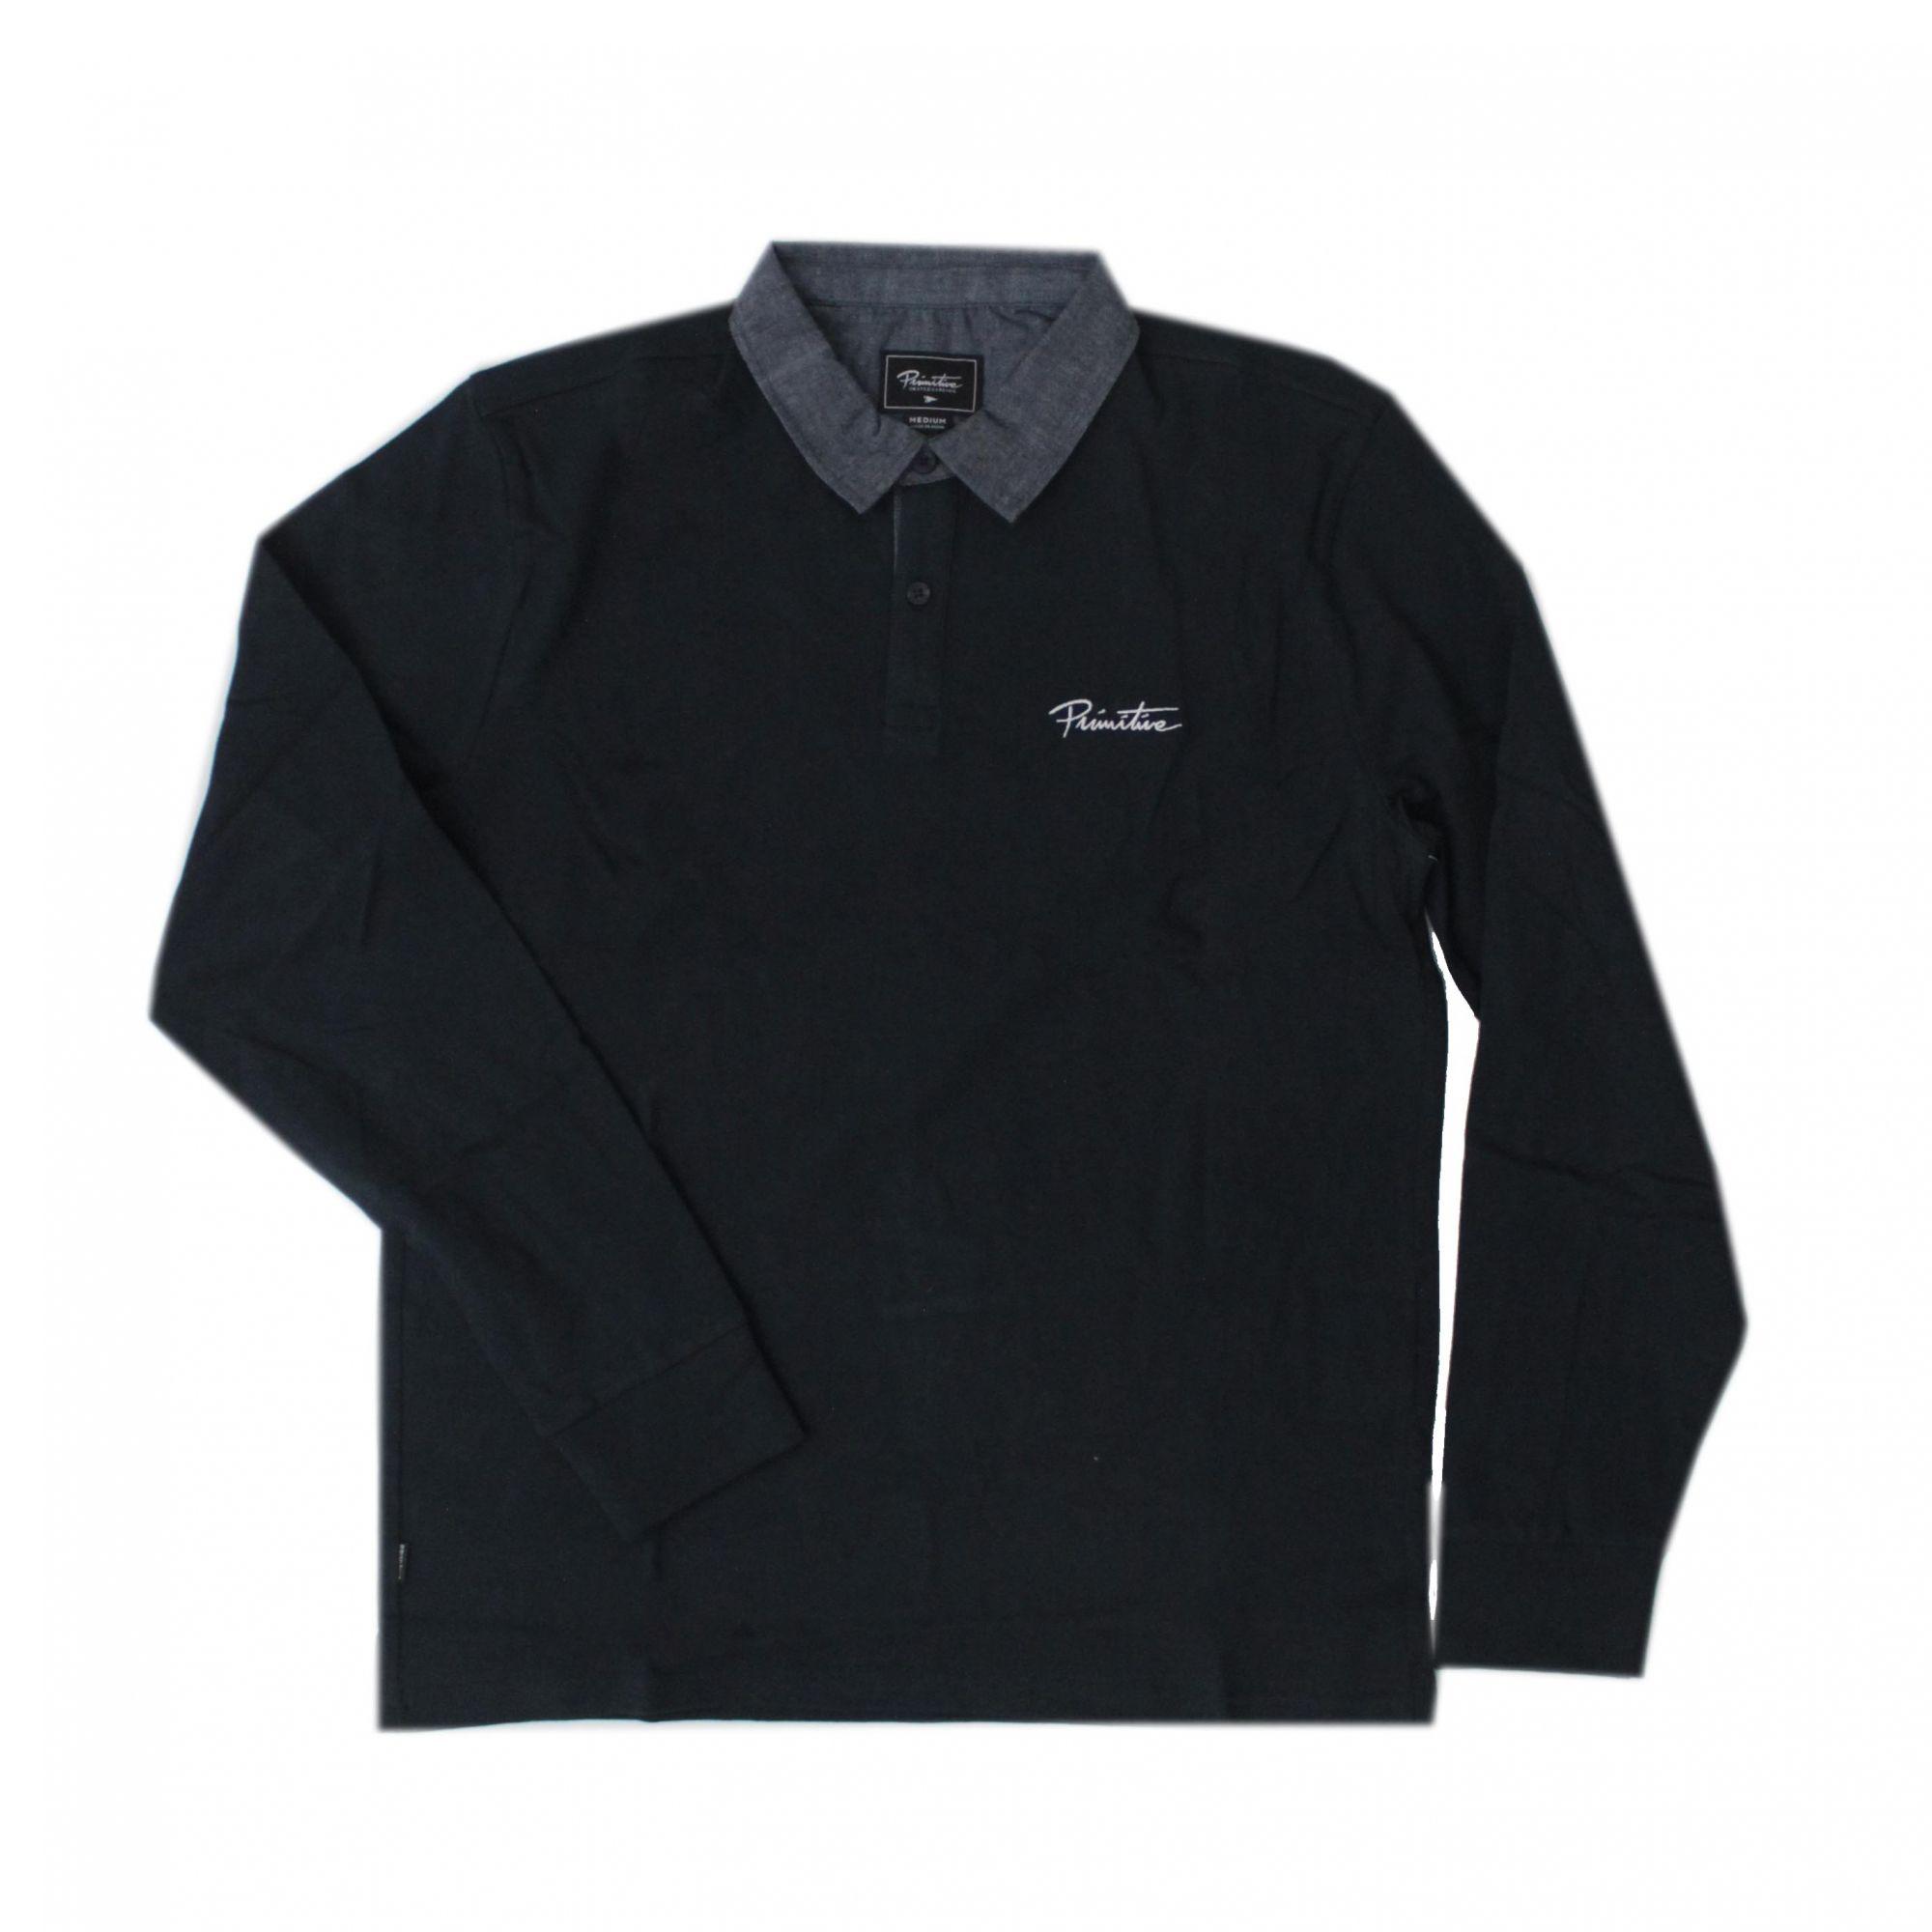 Camisa Polo Primitive Solid Rugby - Azul Marinho (Importado)